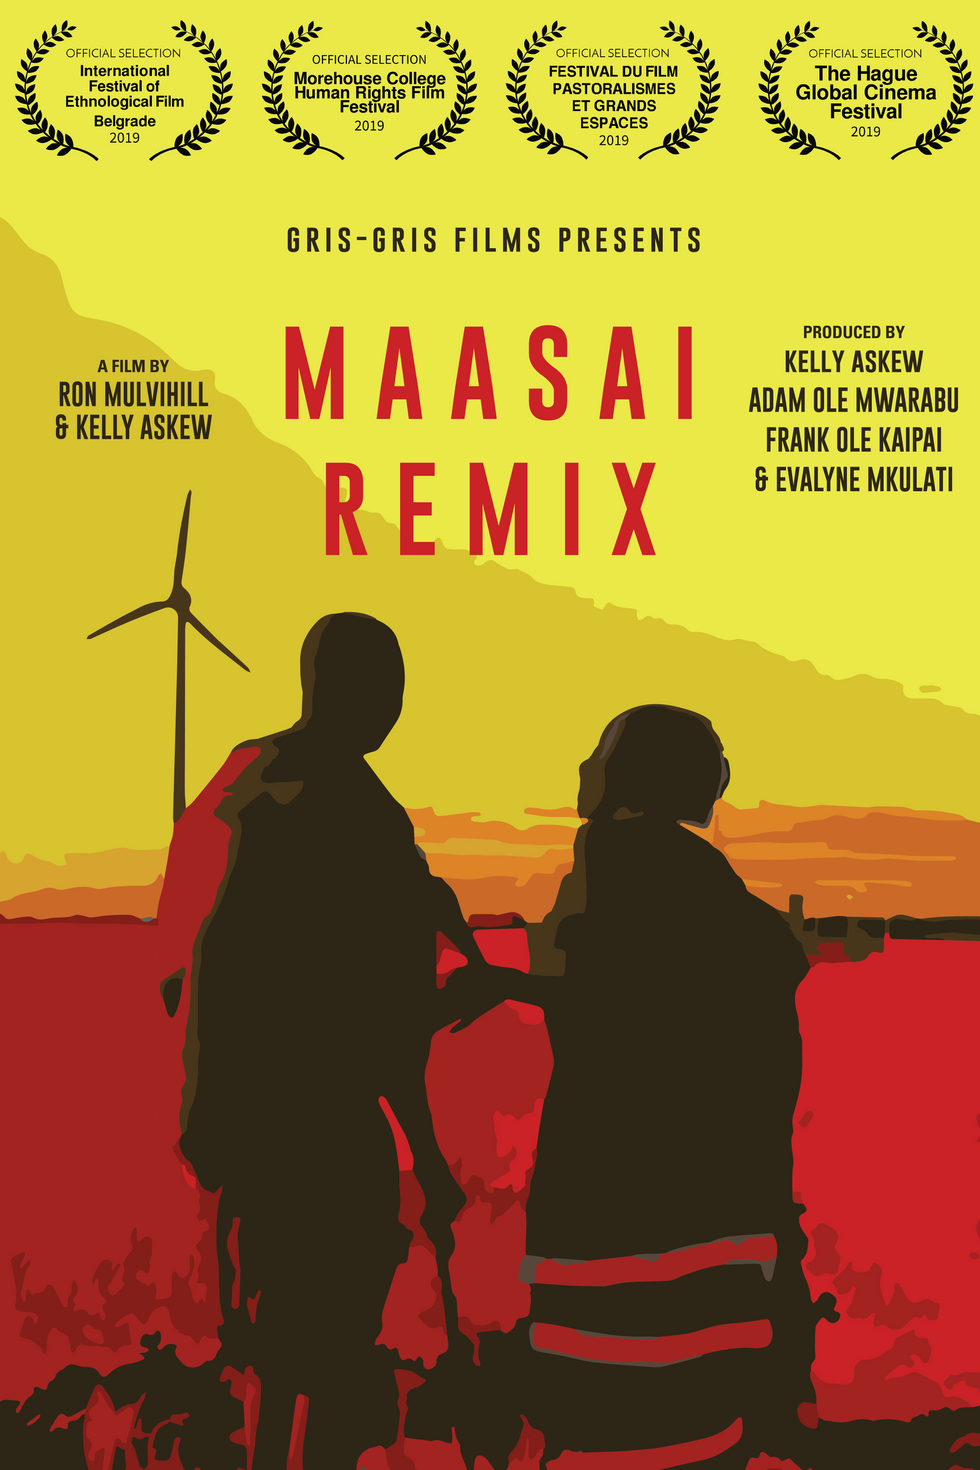 MaasaiRemix_FilmPosters-01.png